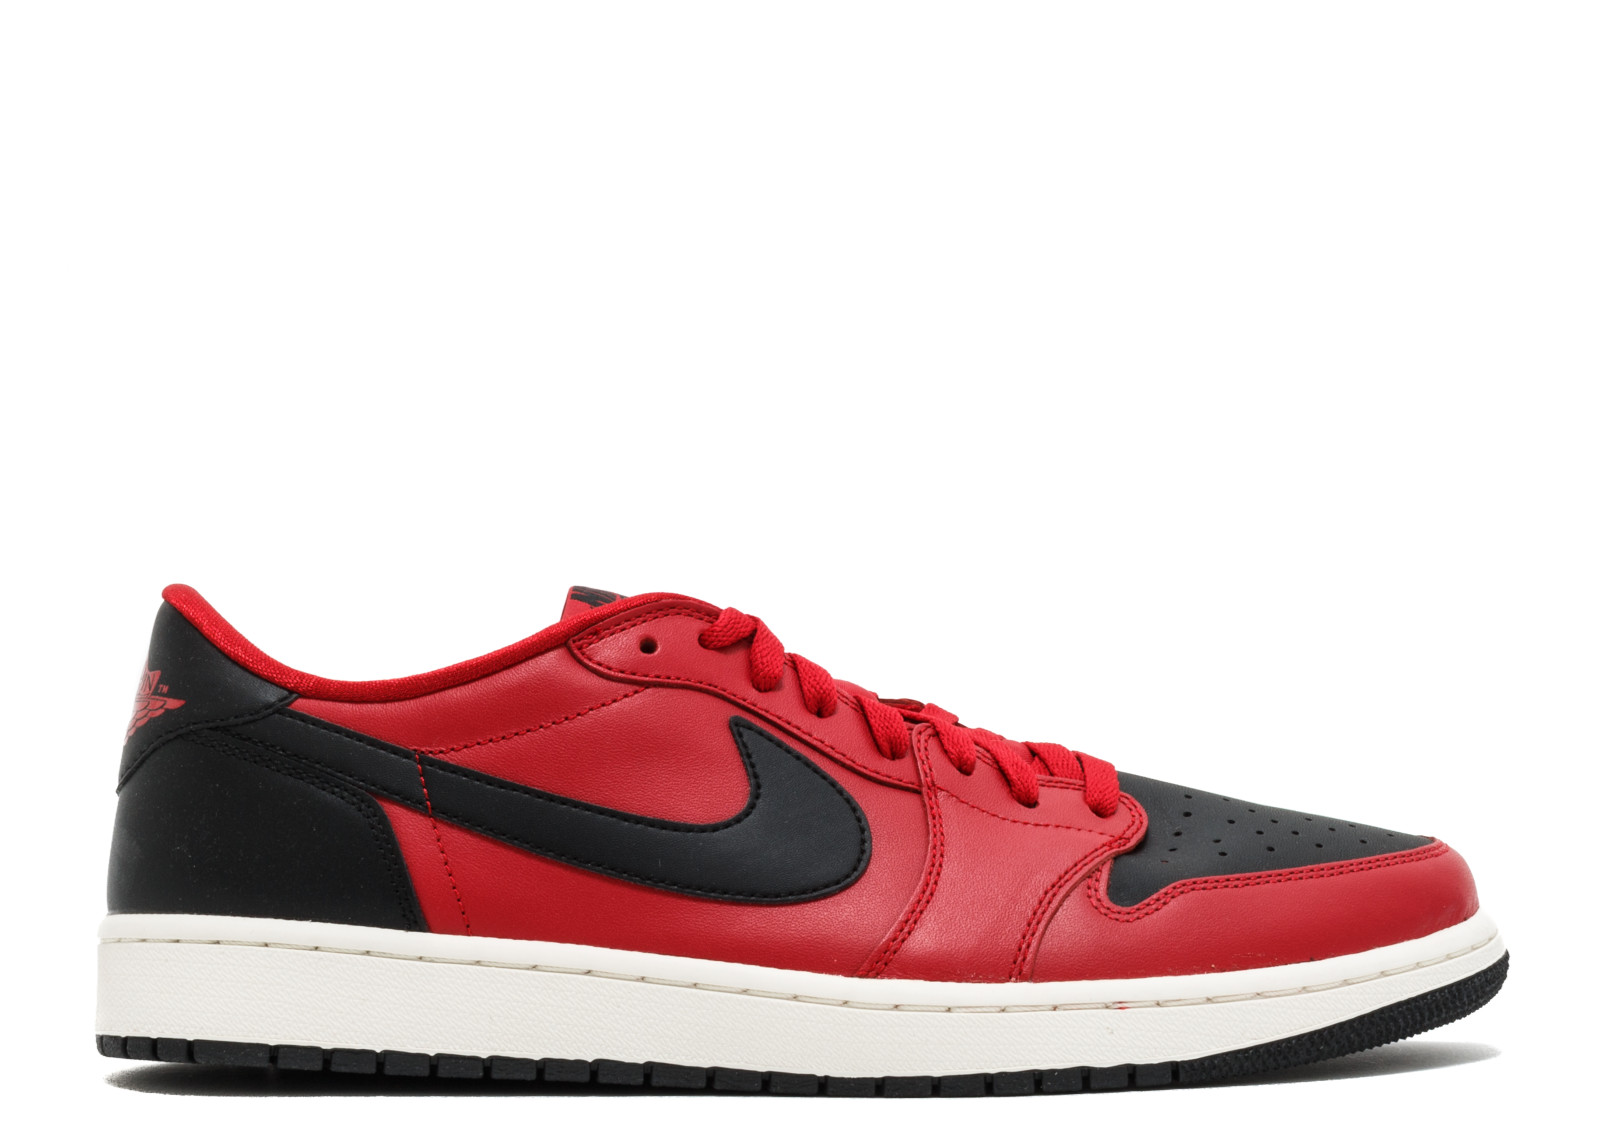 Jordan 1 Retro Low Gym Red Black